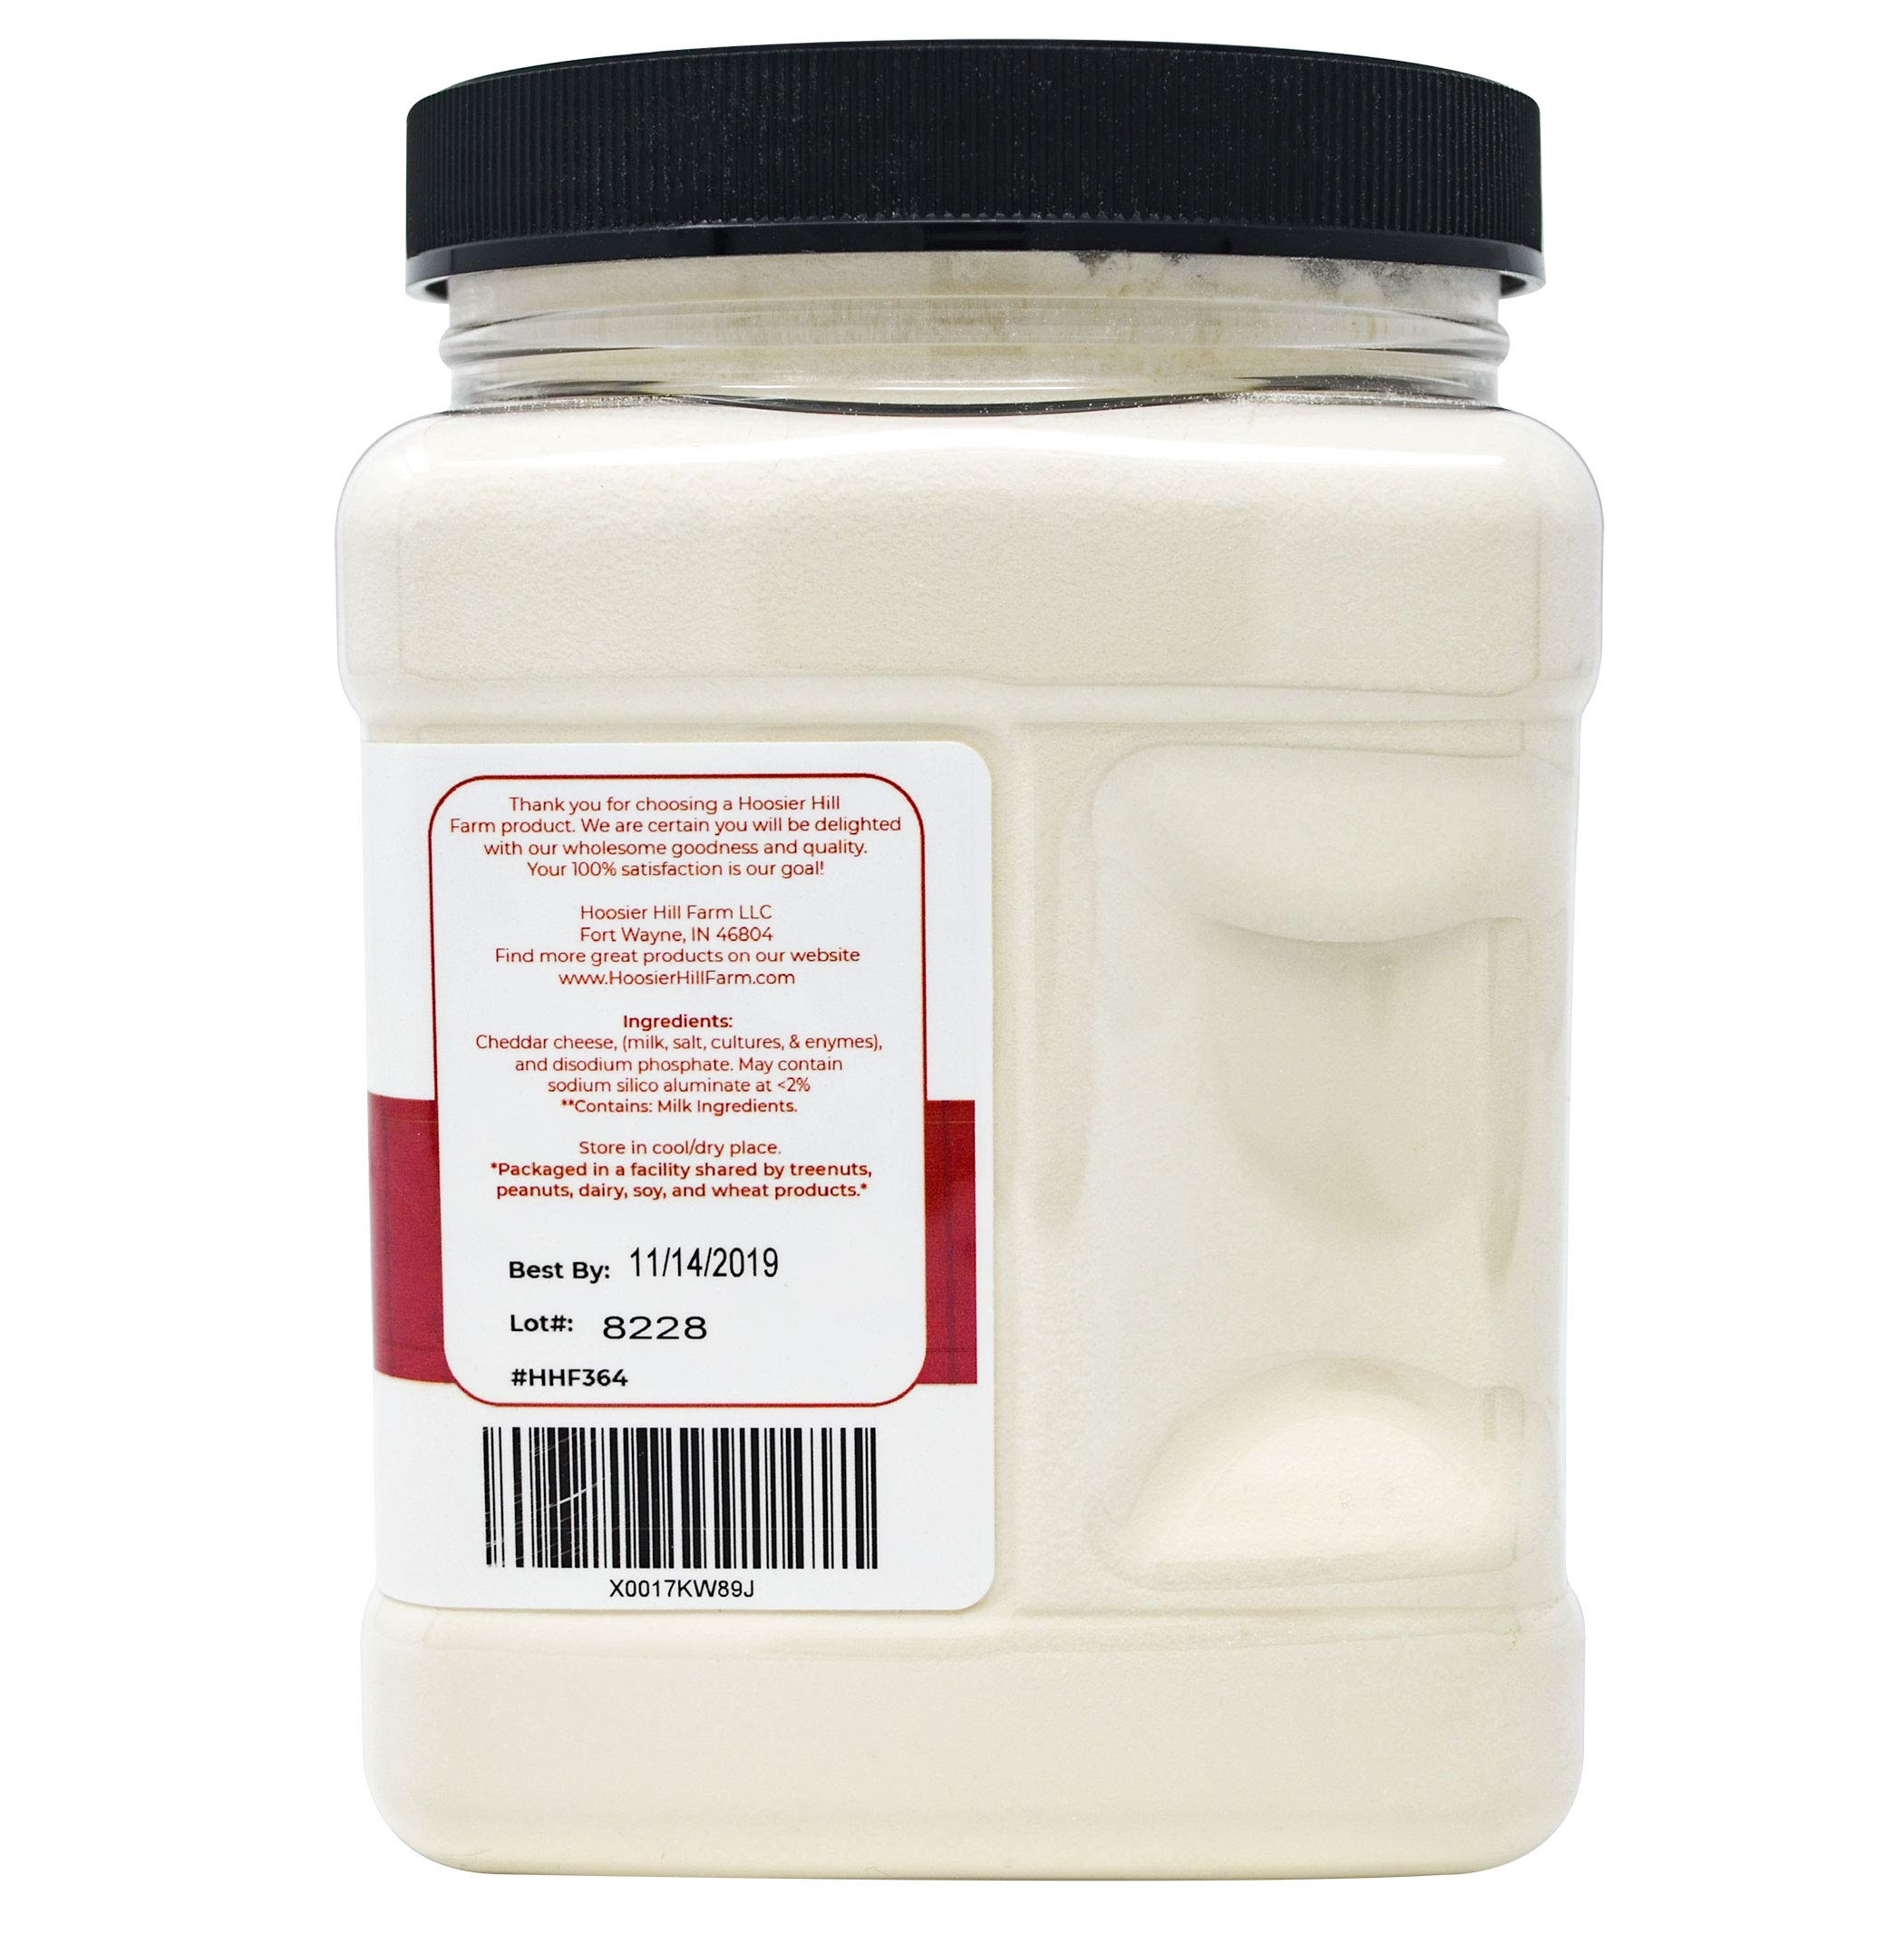 Hoosier Hill Farm Premium White Cheddar Cheese Powder, Natural (1 lb) rBGH and rBST.free. by Hoosier Hill Farm (Image #4)